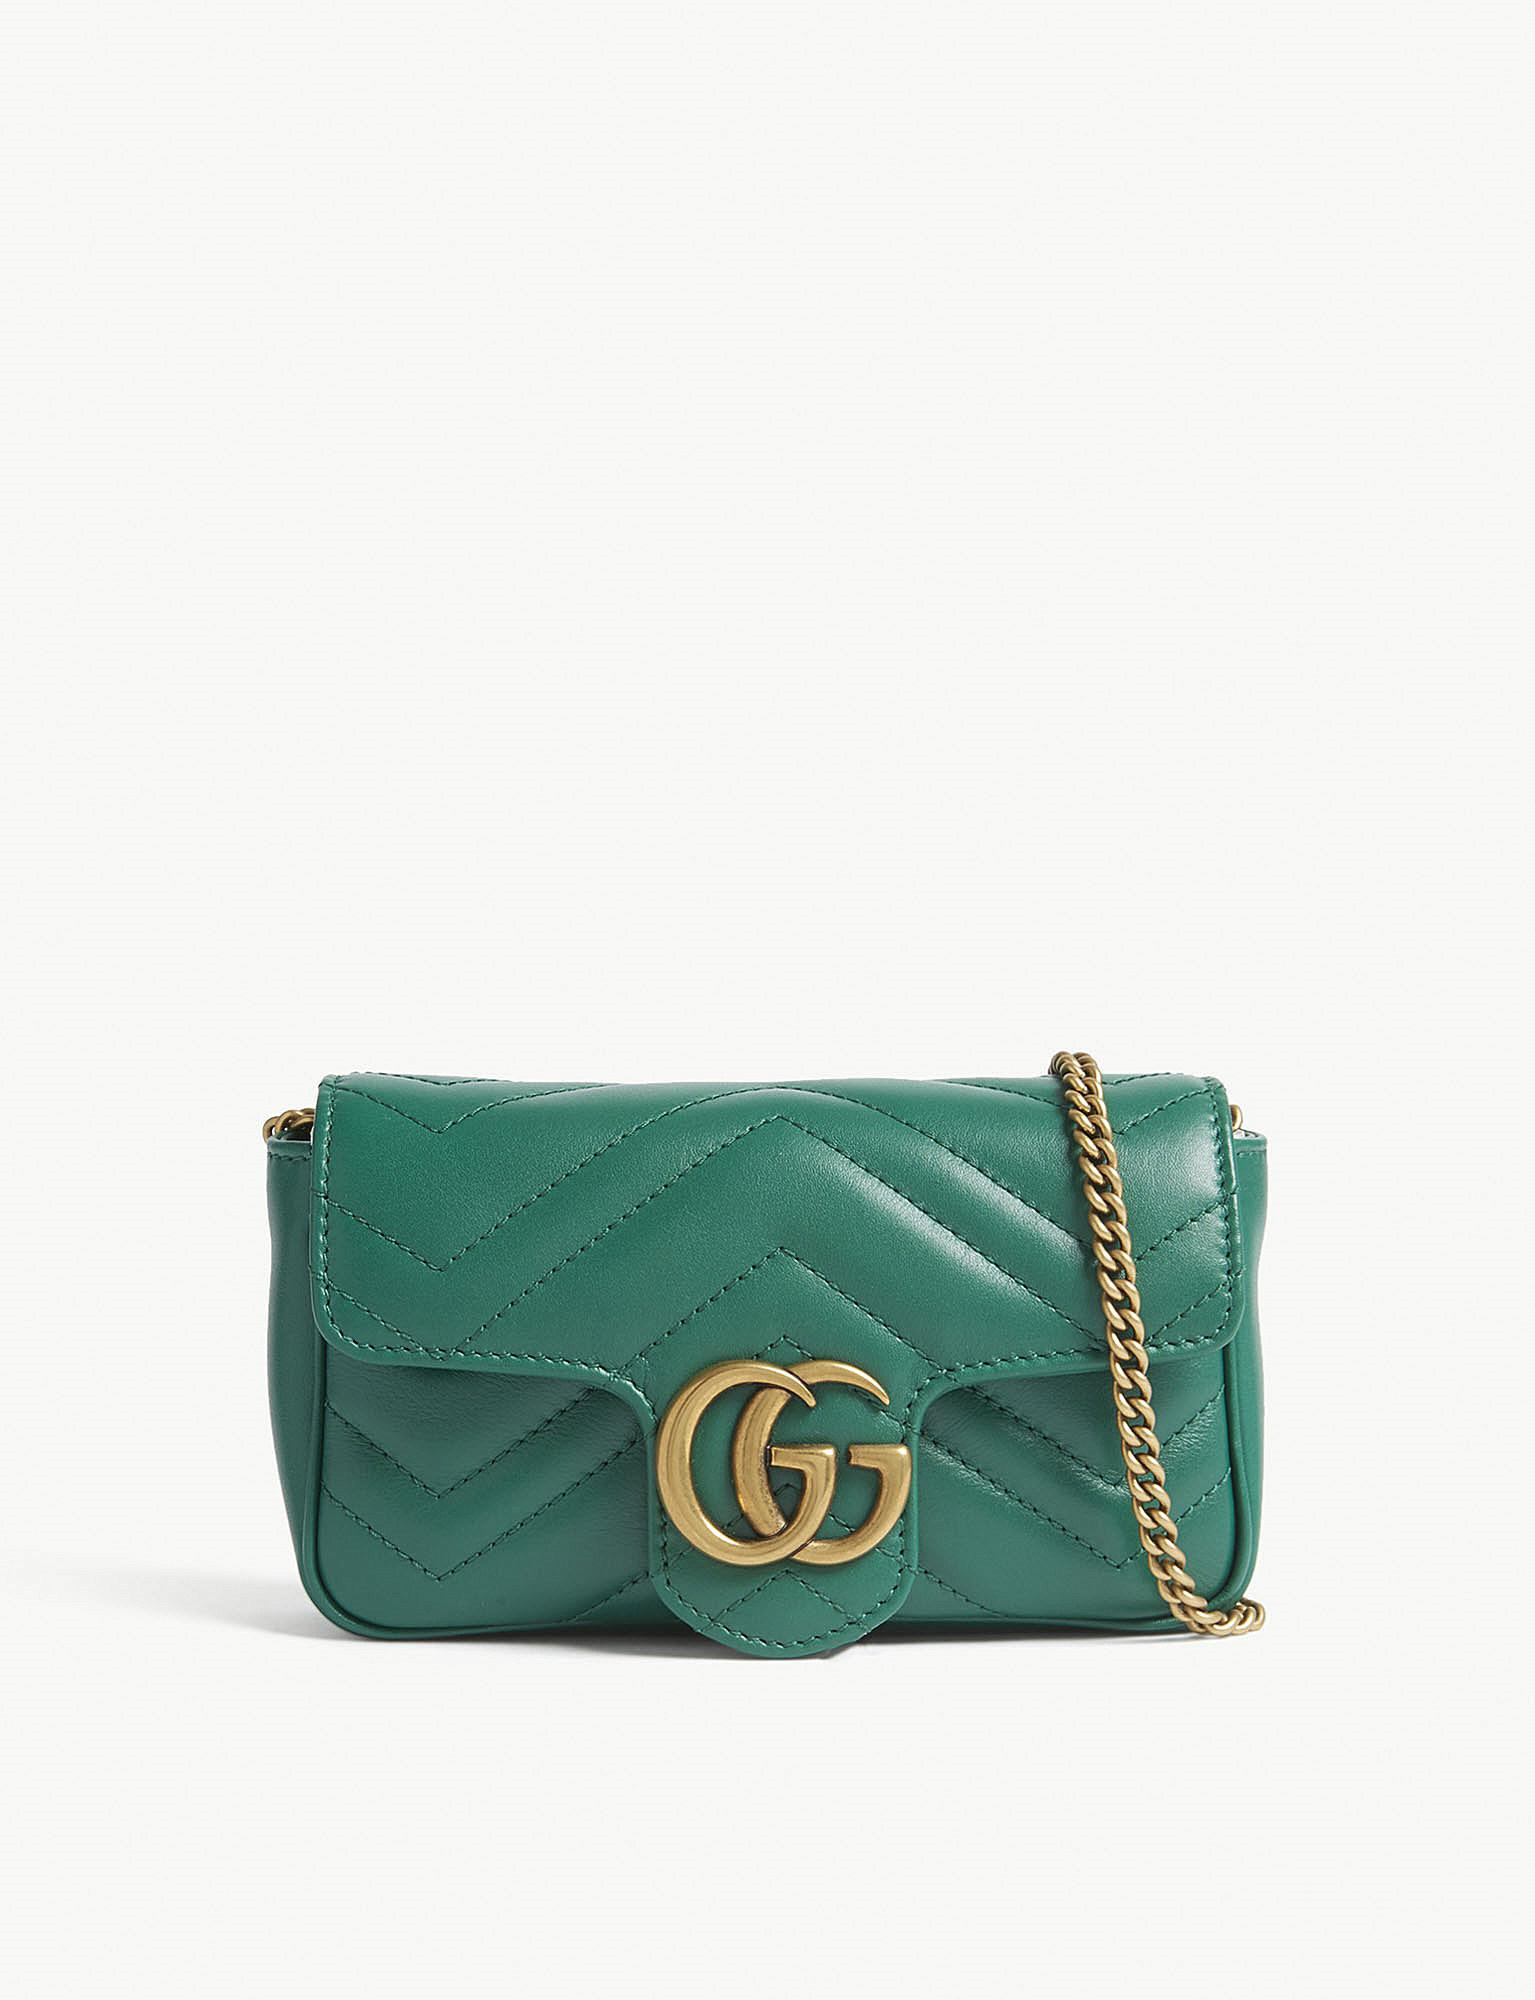 0f3195723ea5 Gucci Marmont Super Mini Leather Shoulder Bag in Green - Lyst